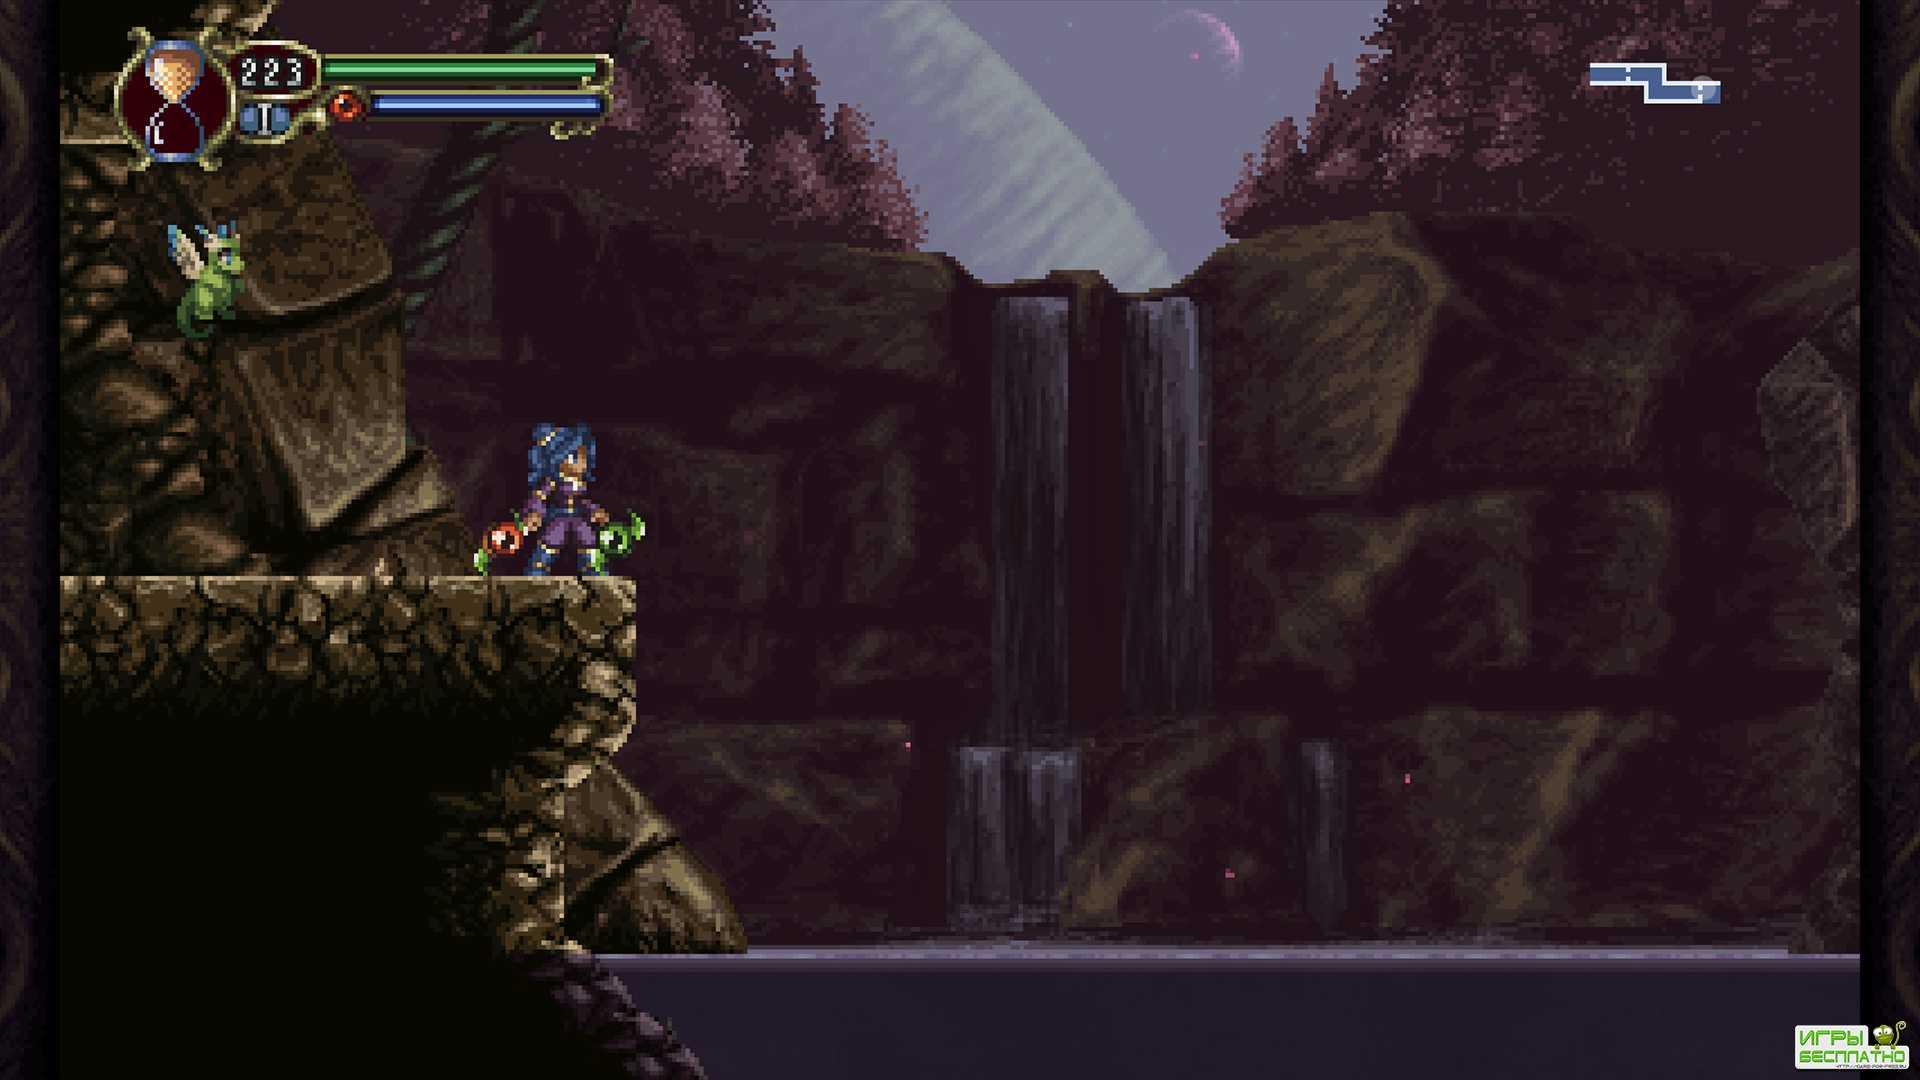 Timespinner GamePlay PC